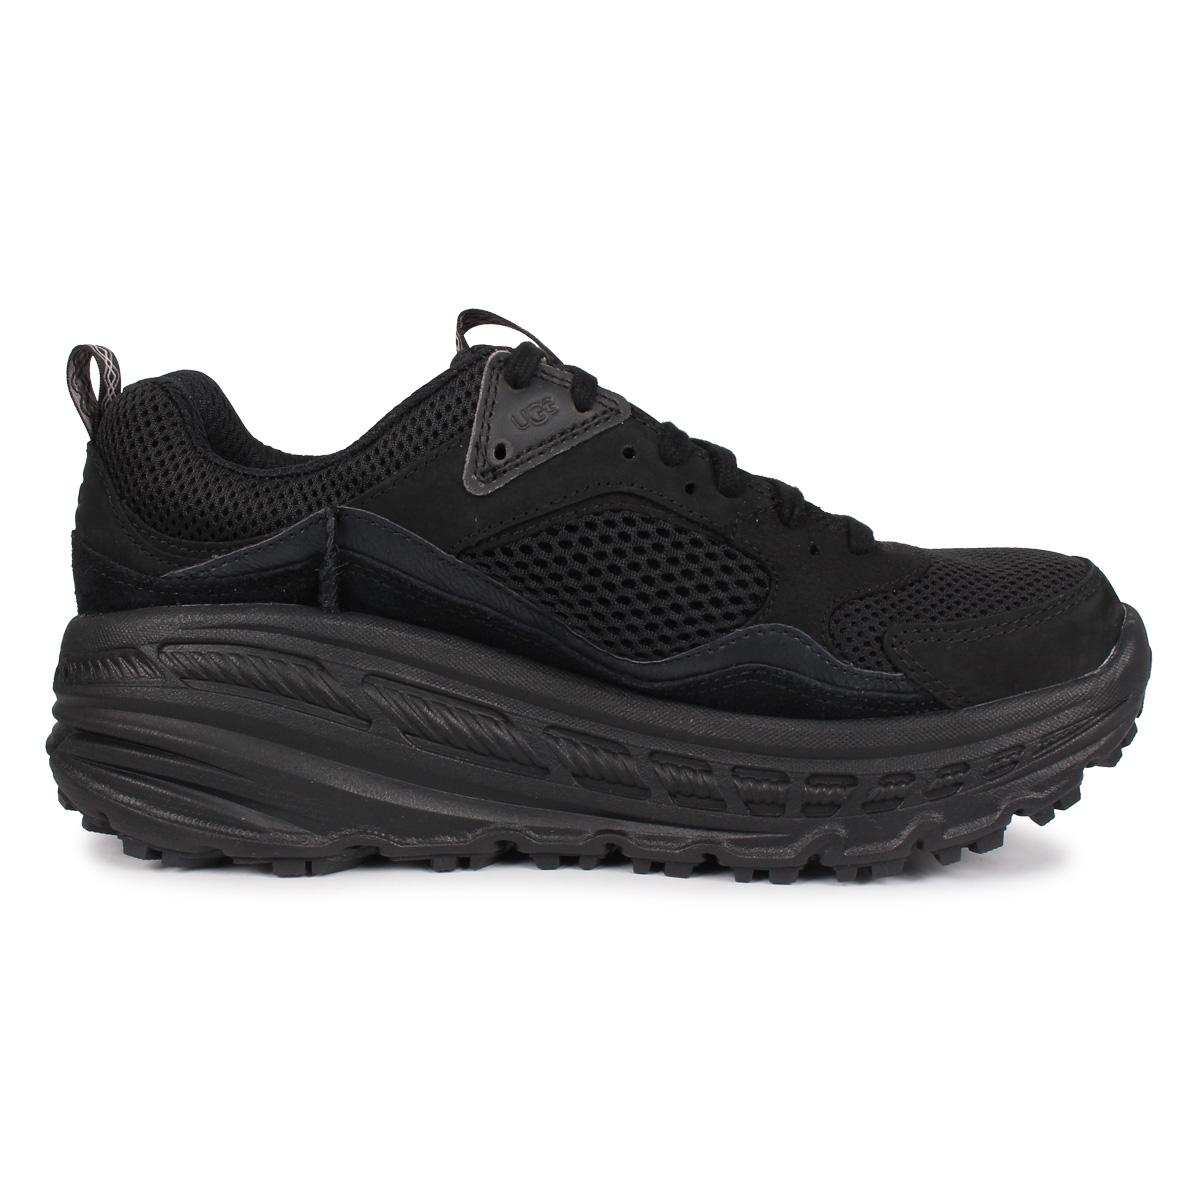 f:id:shoesmaster:20210328230956p:plain